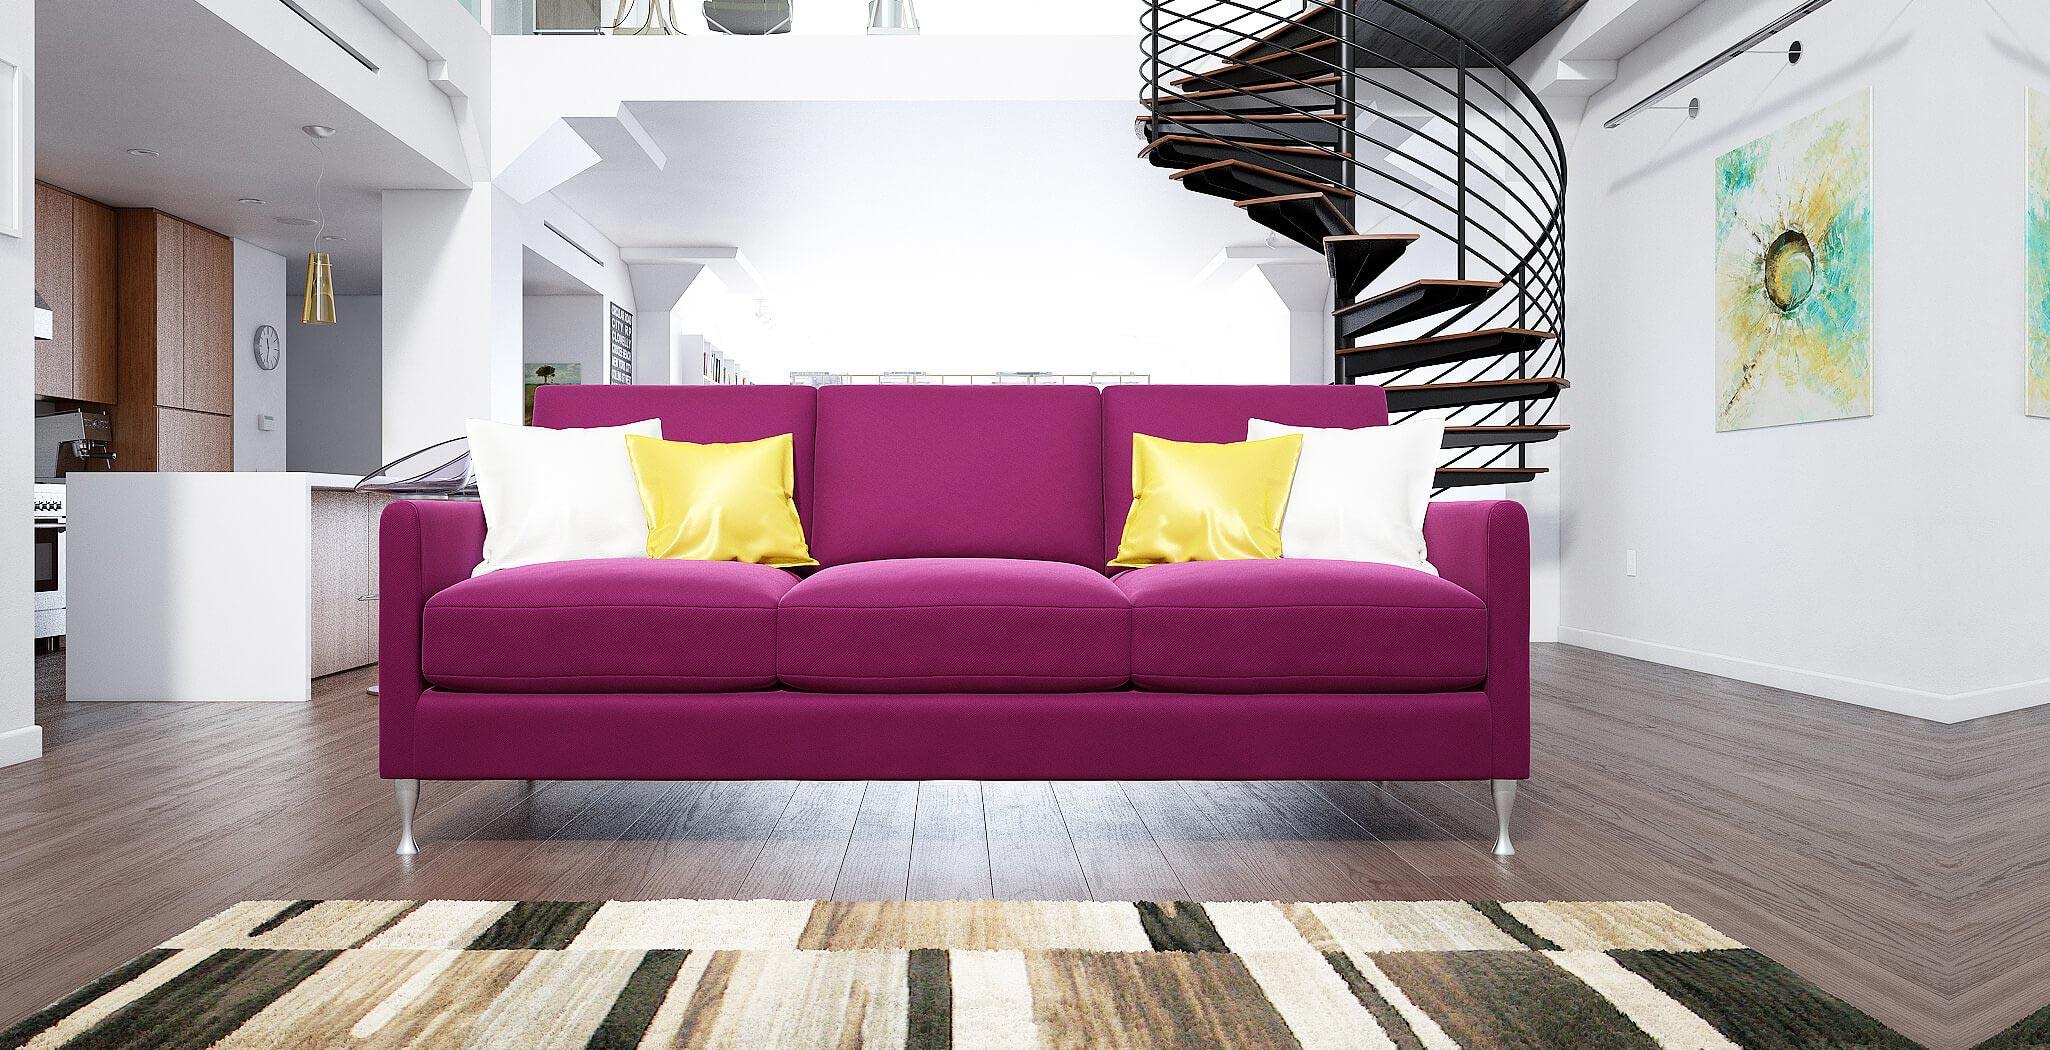 eureka sofa furniture gallery 3